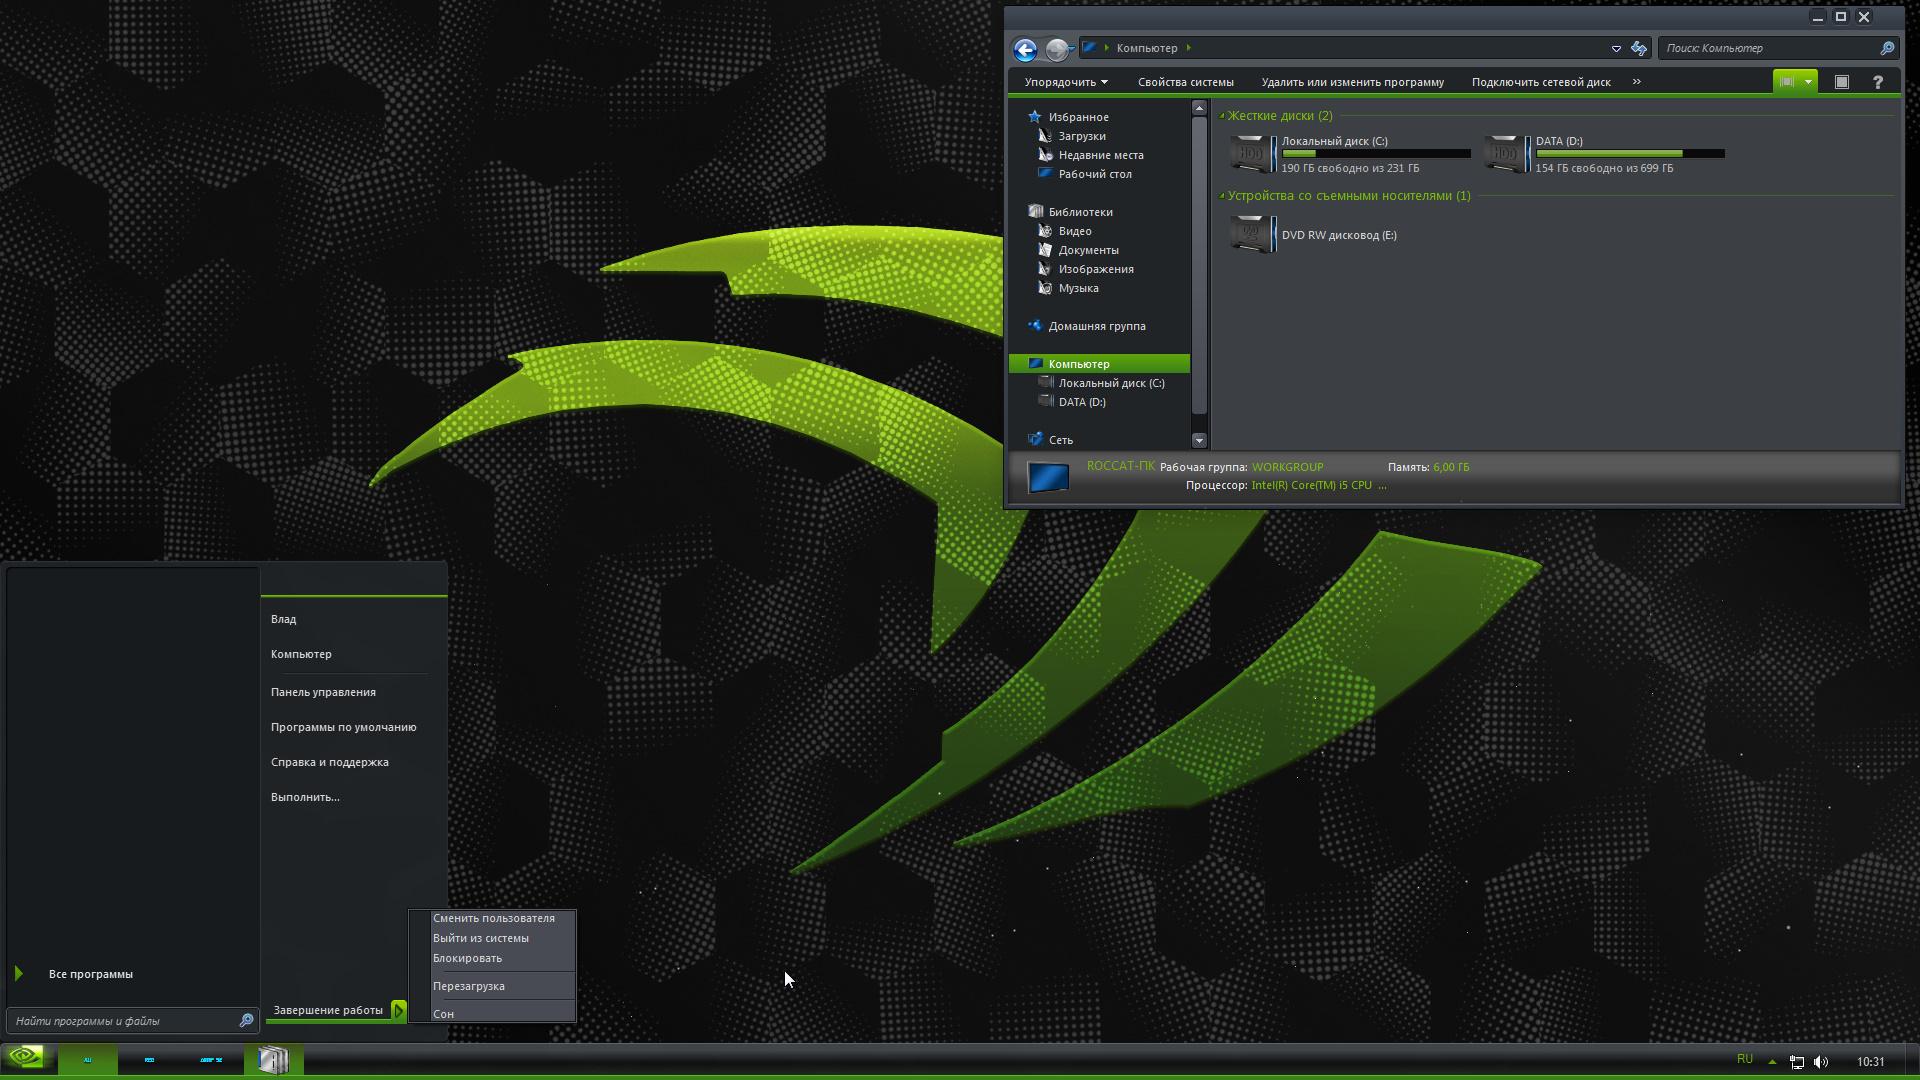 nVidia by cu88 - тема в стиле Нвидиа для windows 7